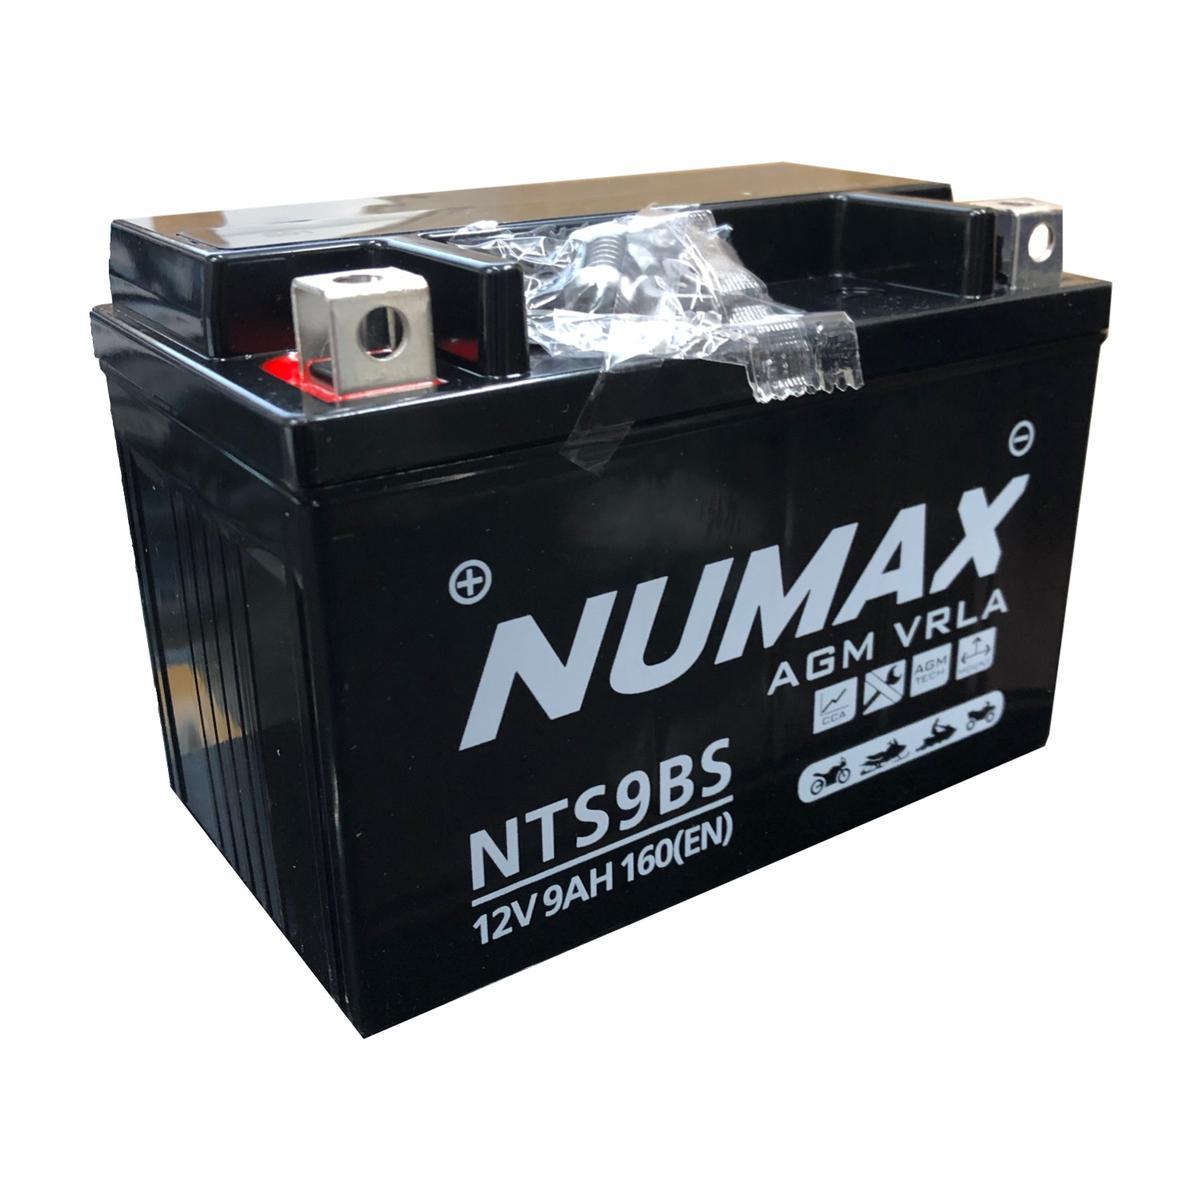 Numax NTS9BS 12v Motorbike Bike Battery KYMCO 125cc Calypso YXT9-4